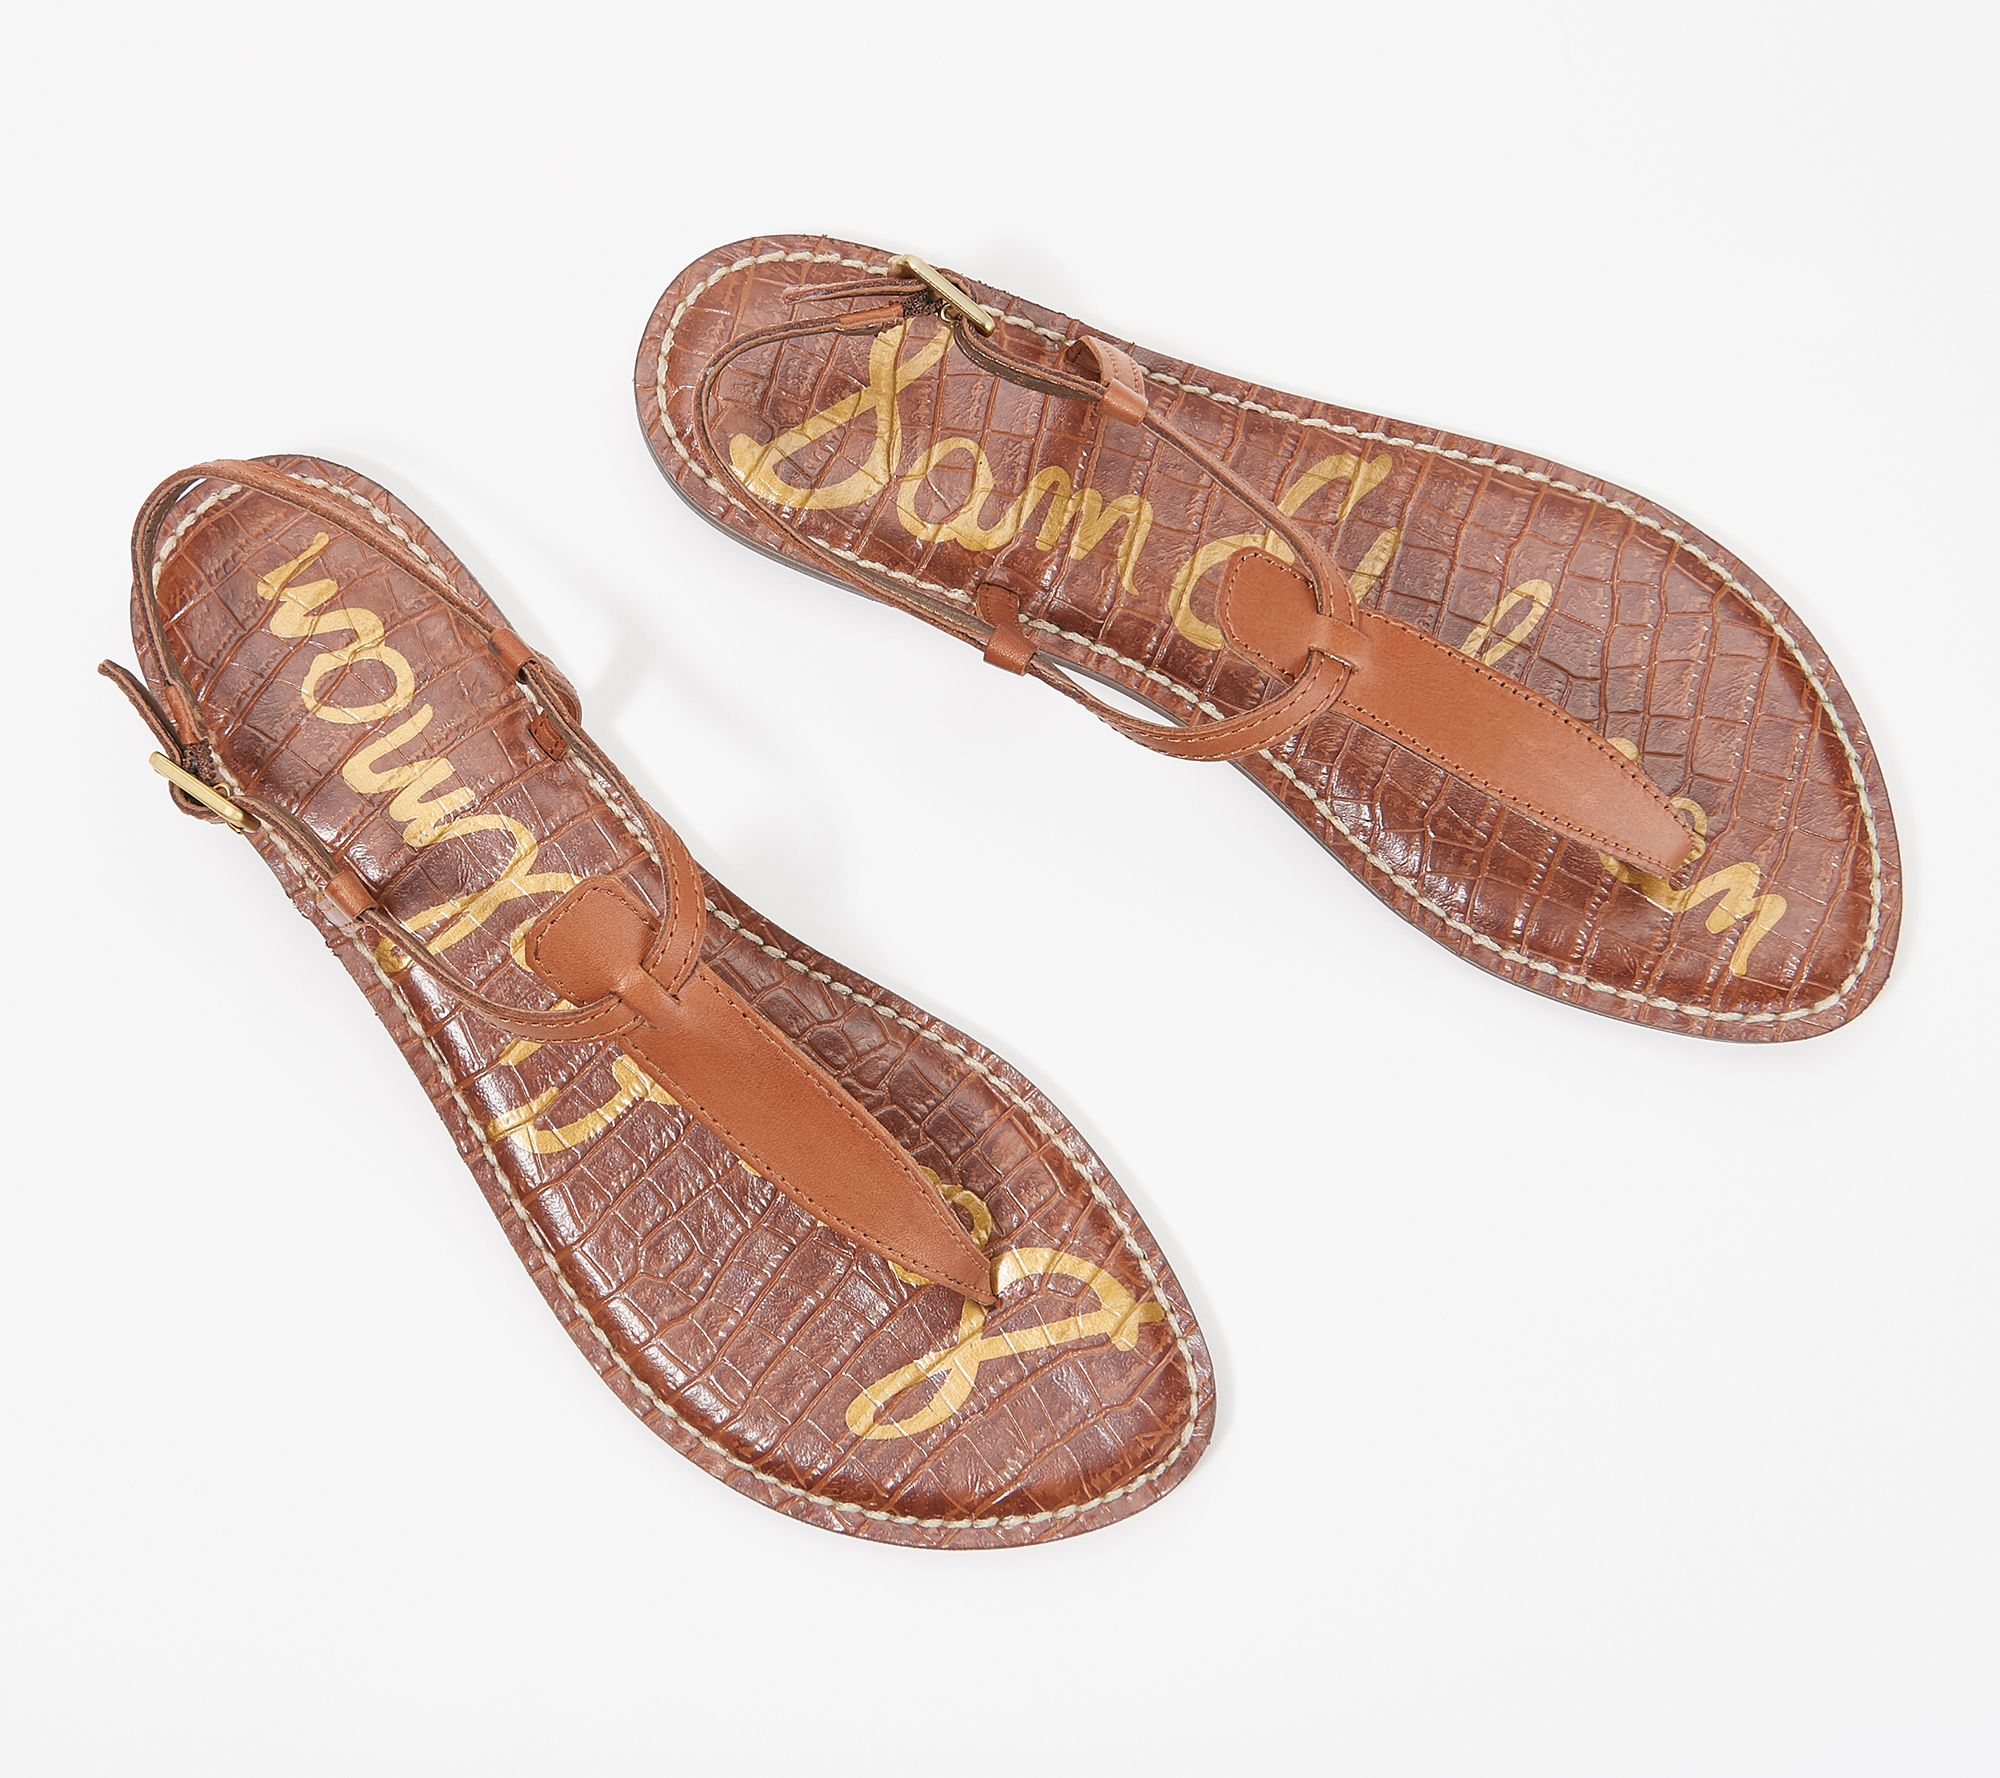 6d21bdb17 Sam Edelman T-Strap Thong Sandals - Gigi - Page 1 — QVC.com